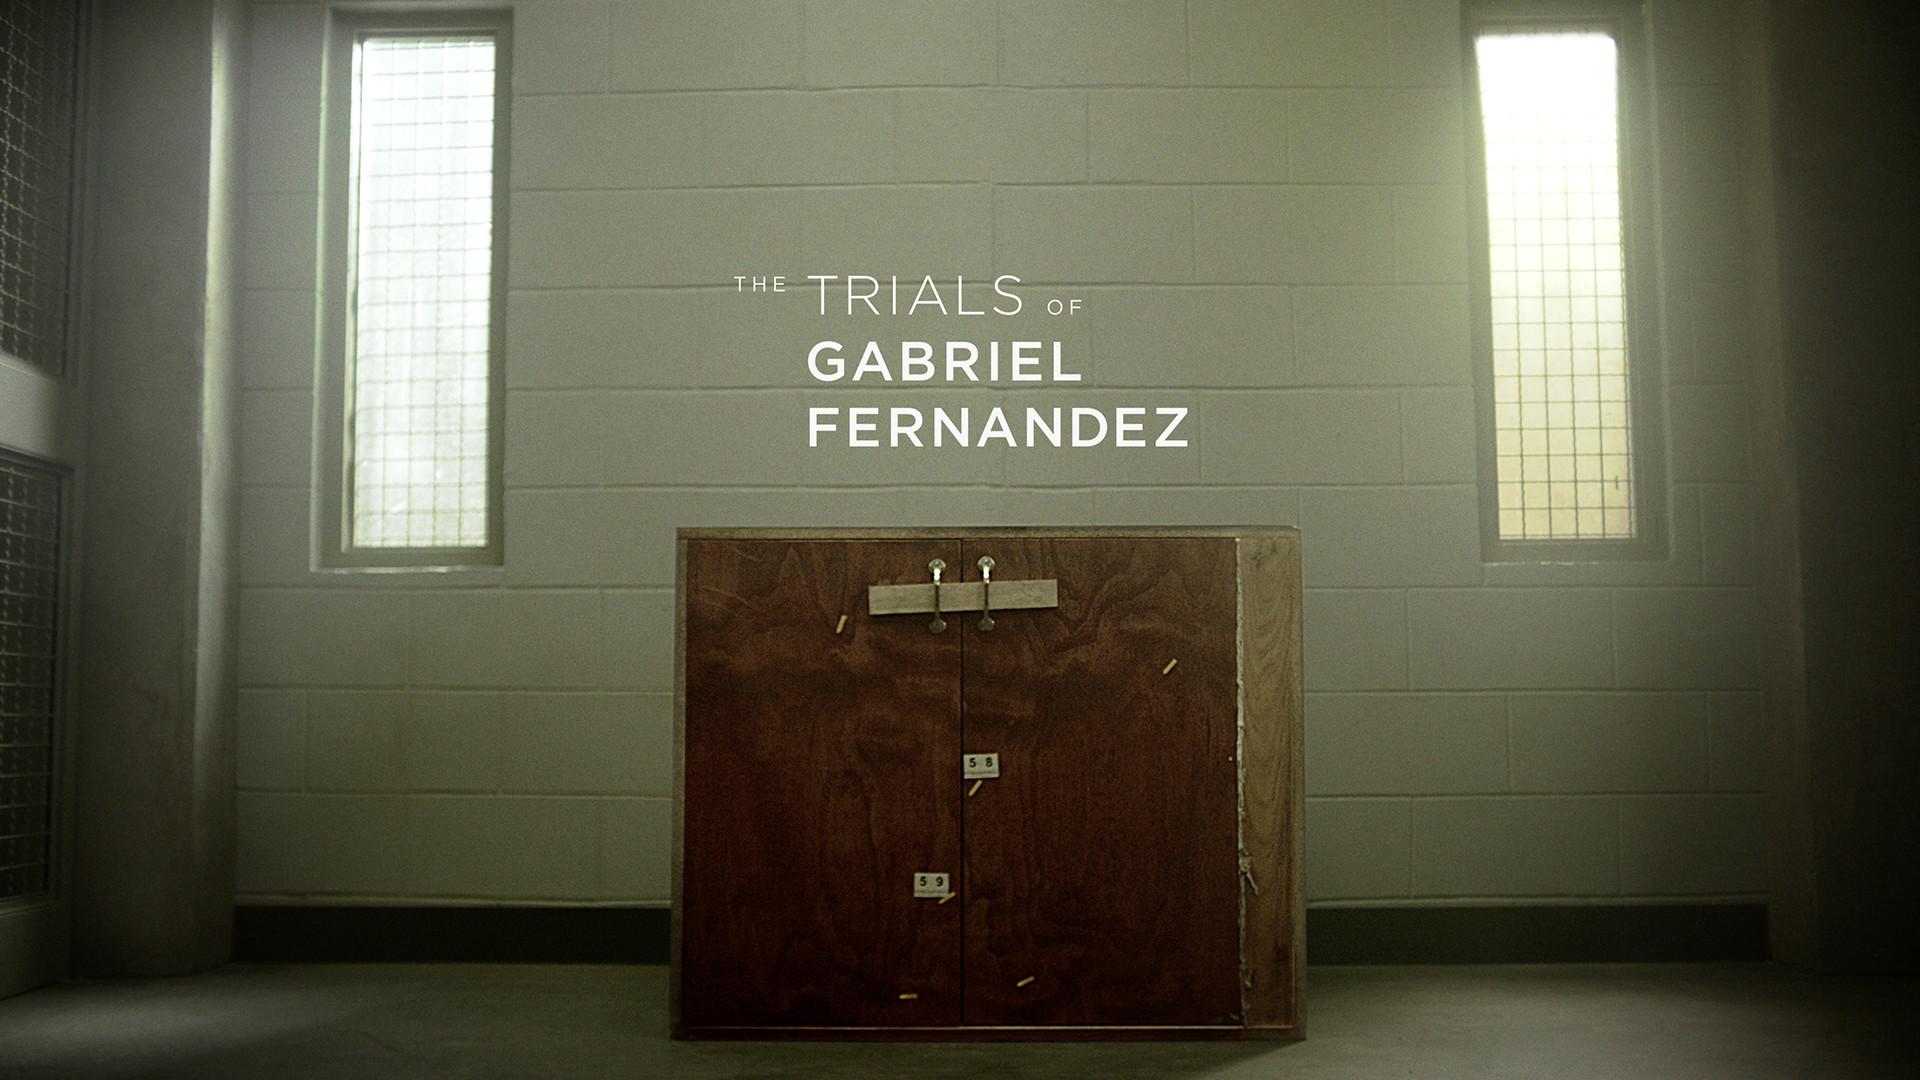 Trials of Gabriel Fernandez - the Process